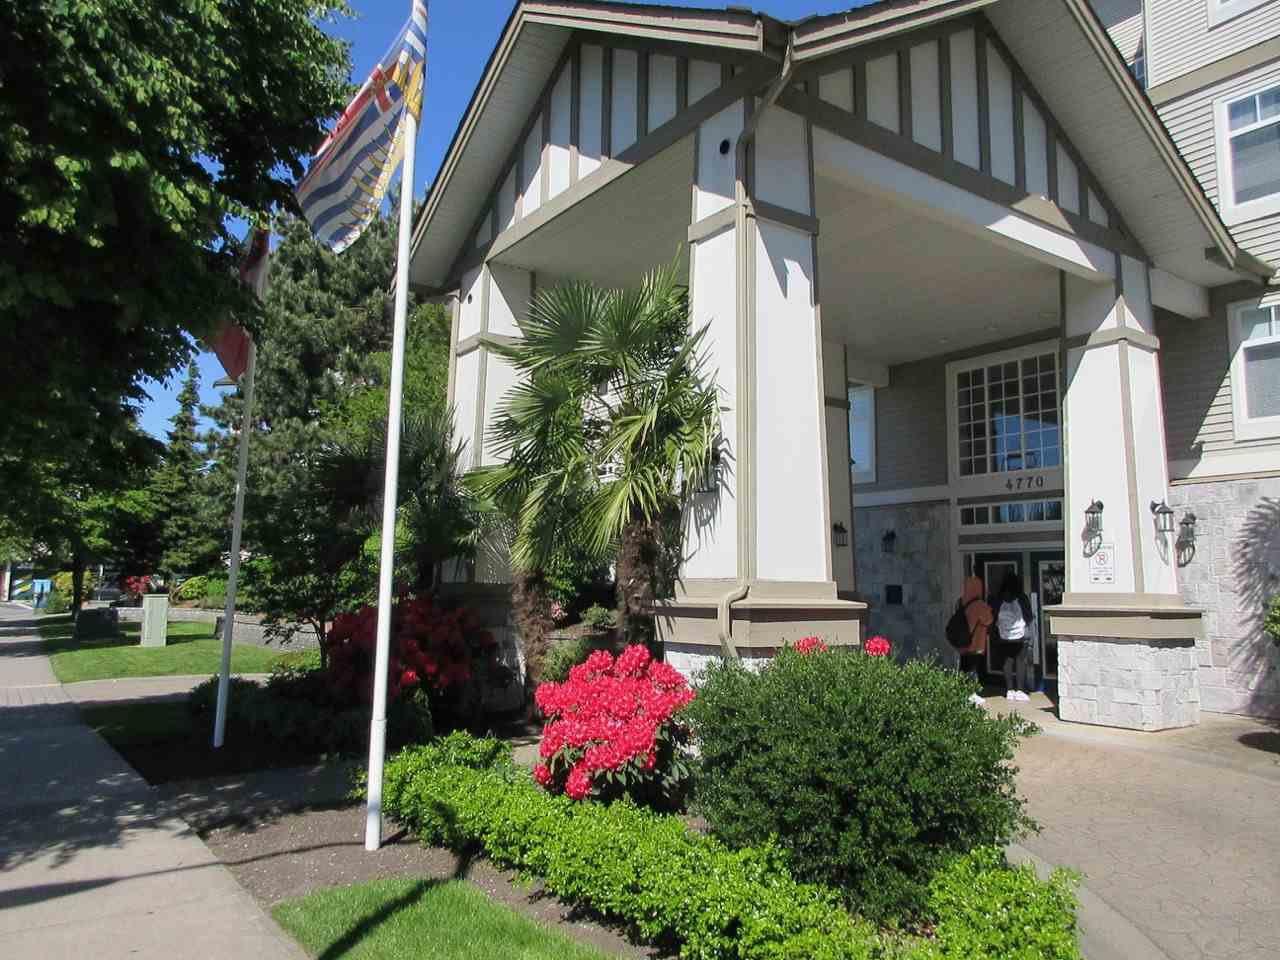 Main Photo: 308 4770 52A STREET in : Delta Manor Condo for sale : MLS®# R2267514